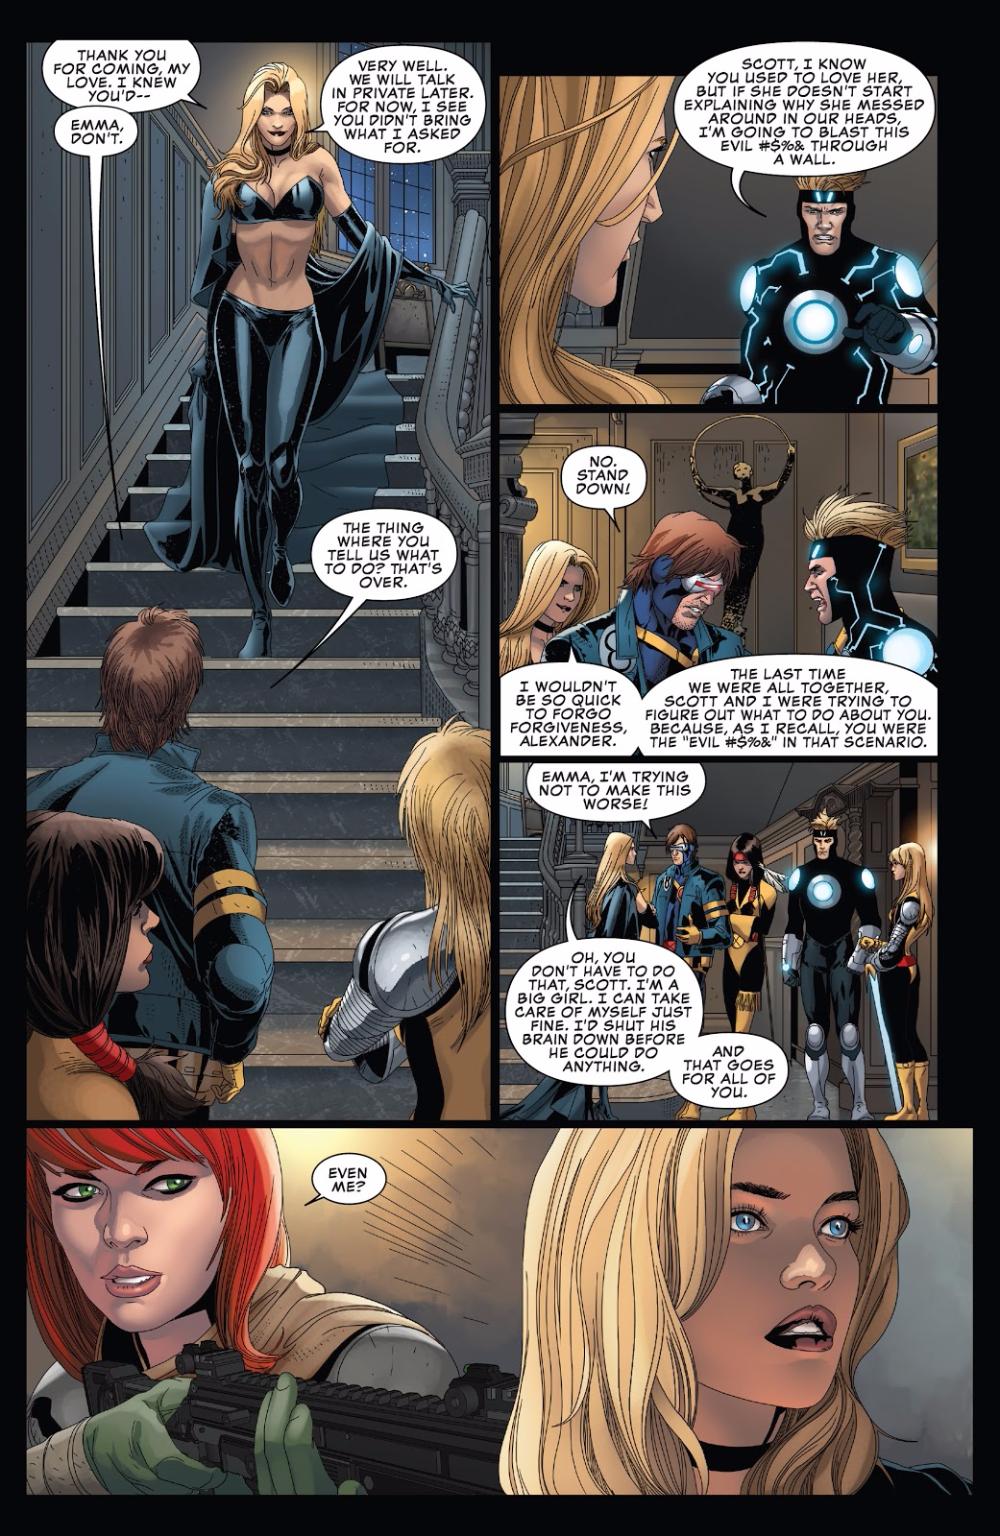 Uncanny X Men 2019 Issue 21 Read Uncanny X Men 2019 Issue 21 Comic Online In High Quality X Men Marvel N Dc Comics Online